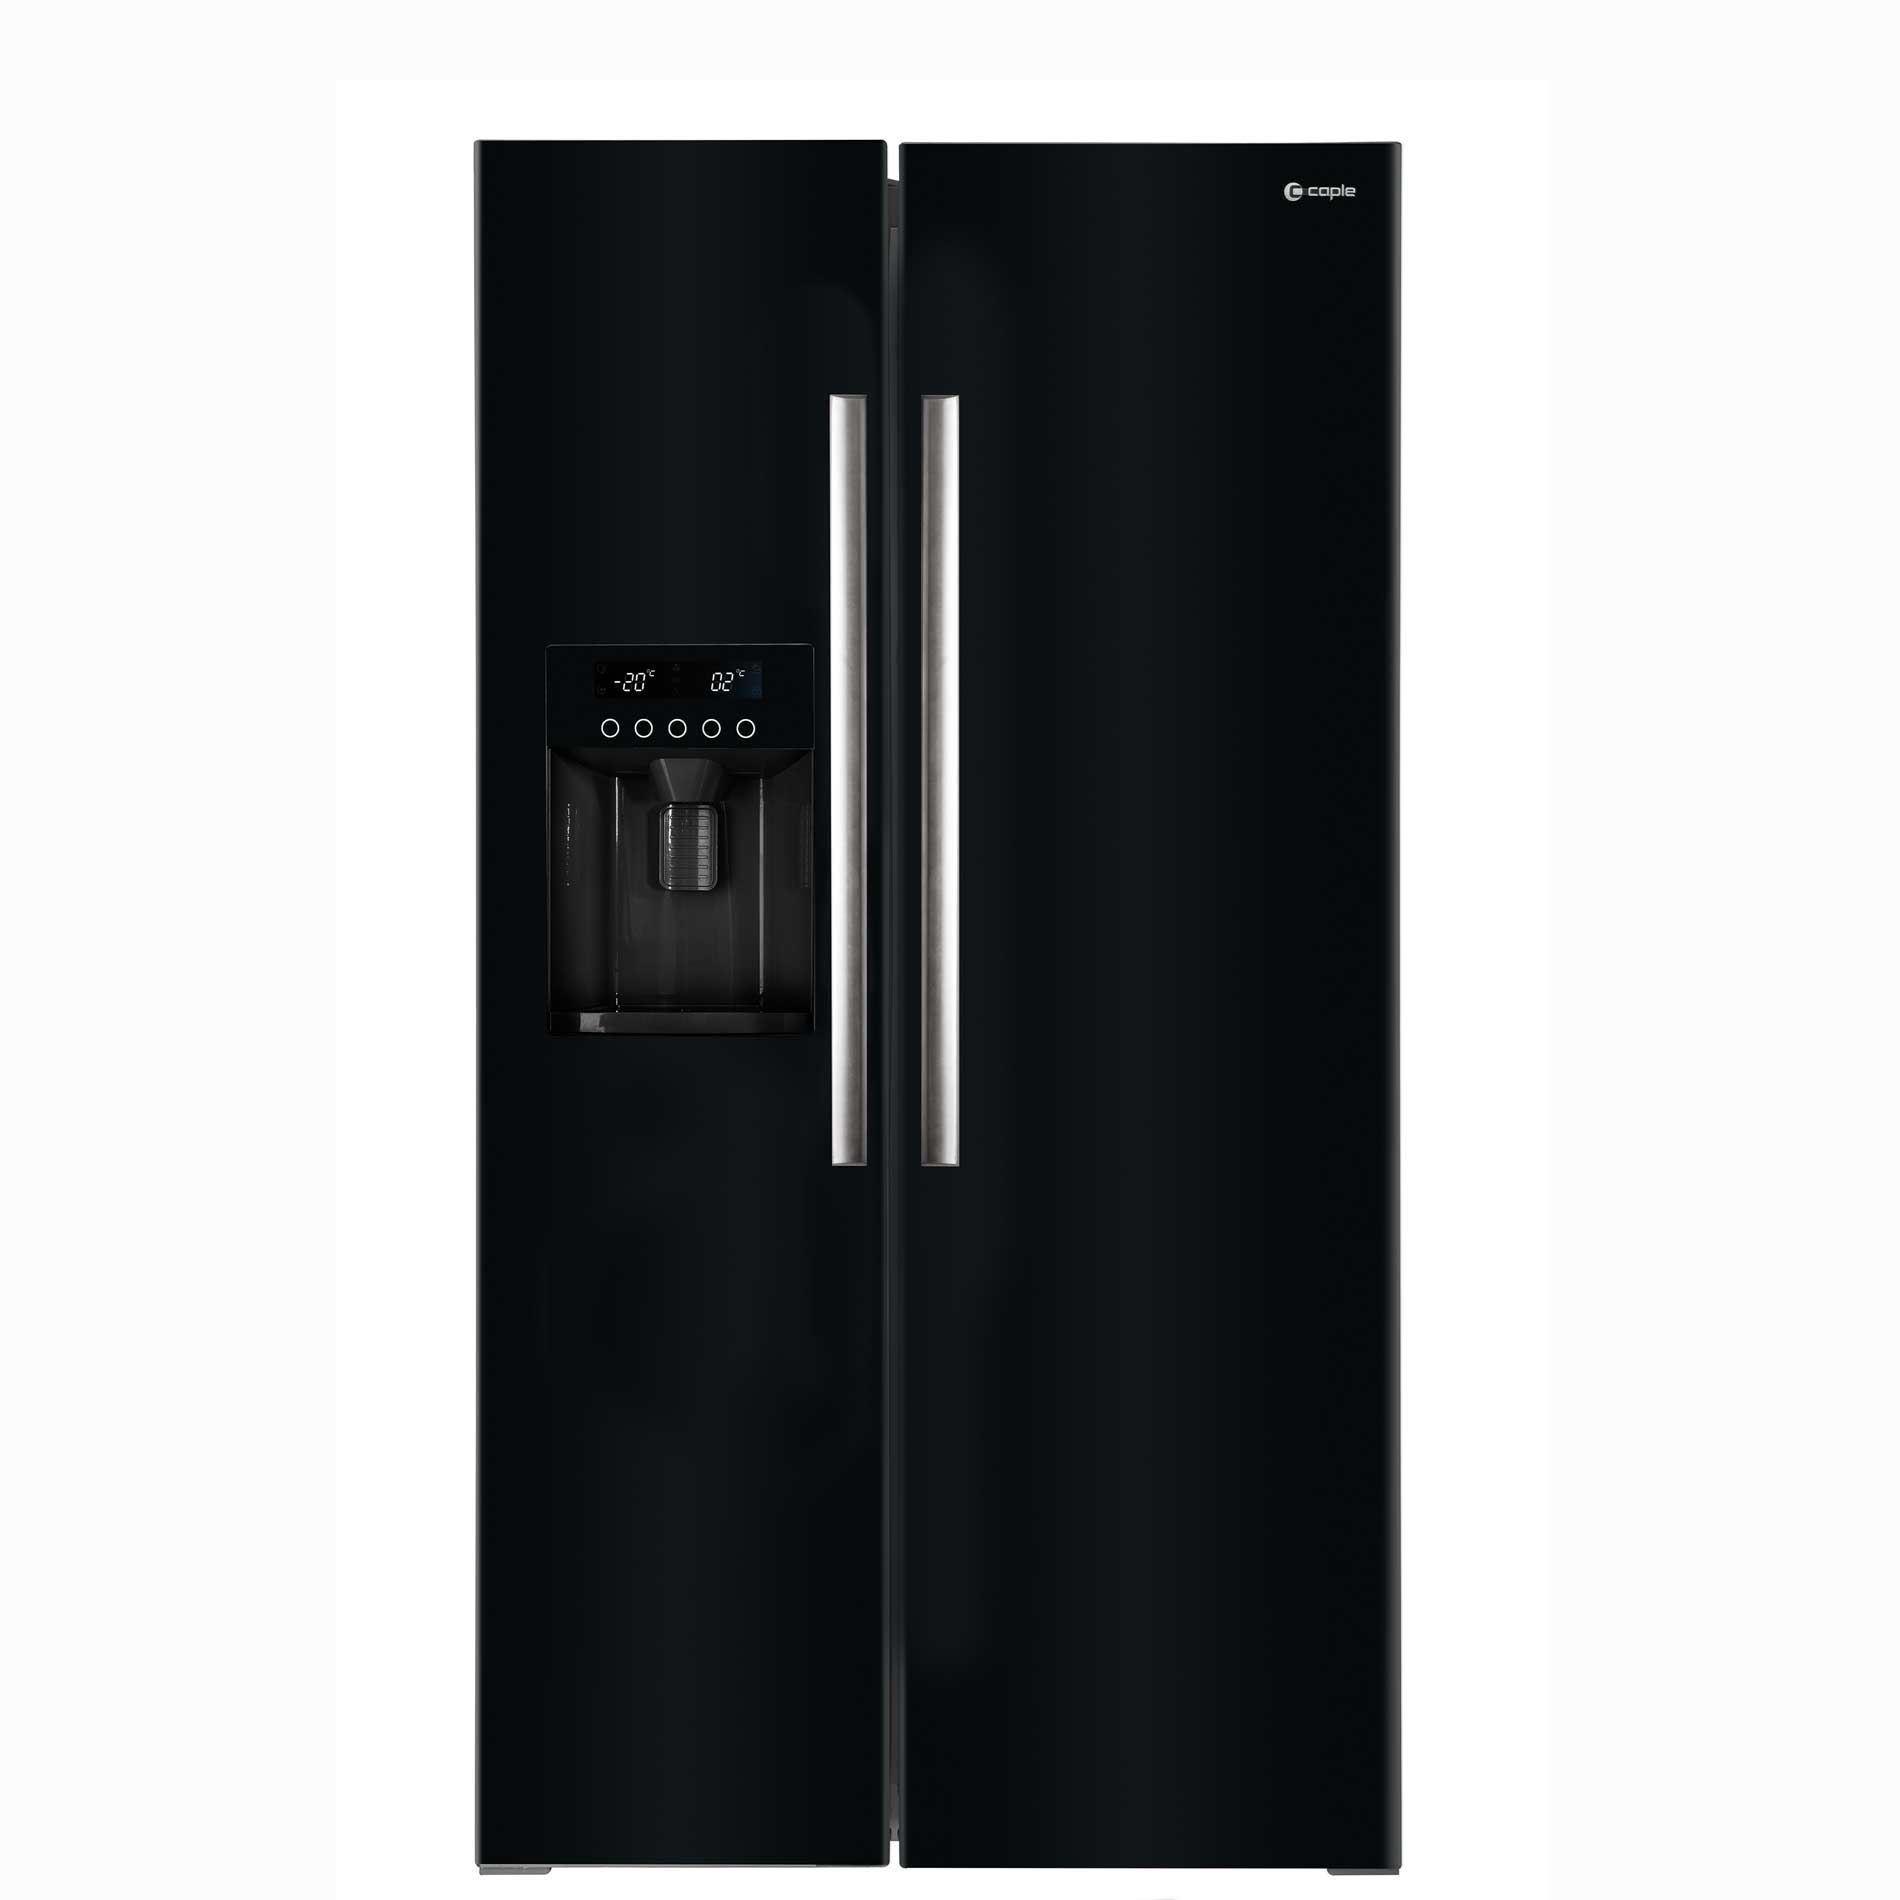 Caple Caff207bk Fridge Freezer In Black Appliance Source